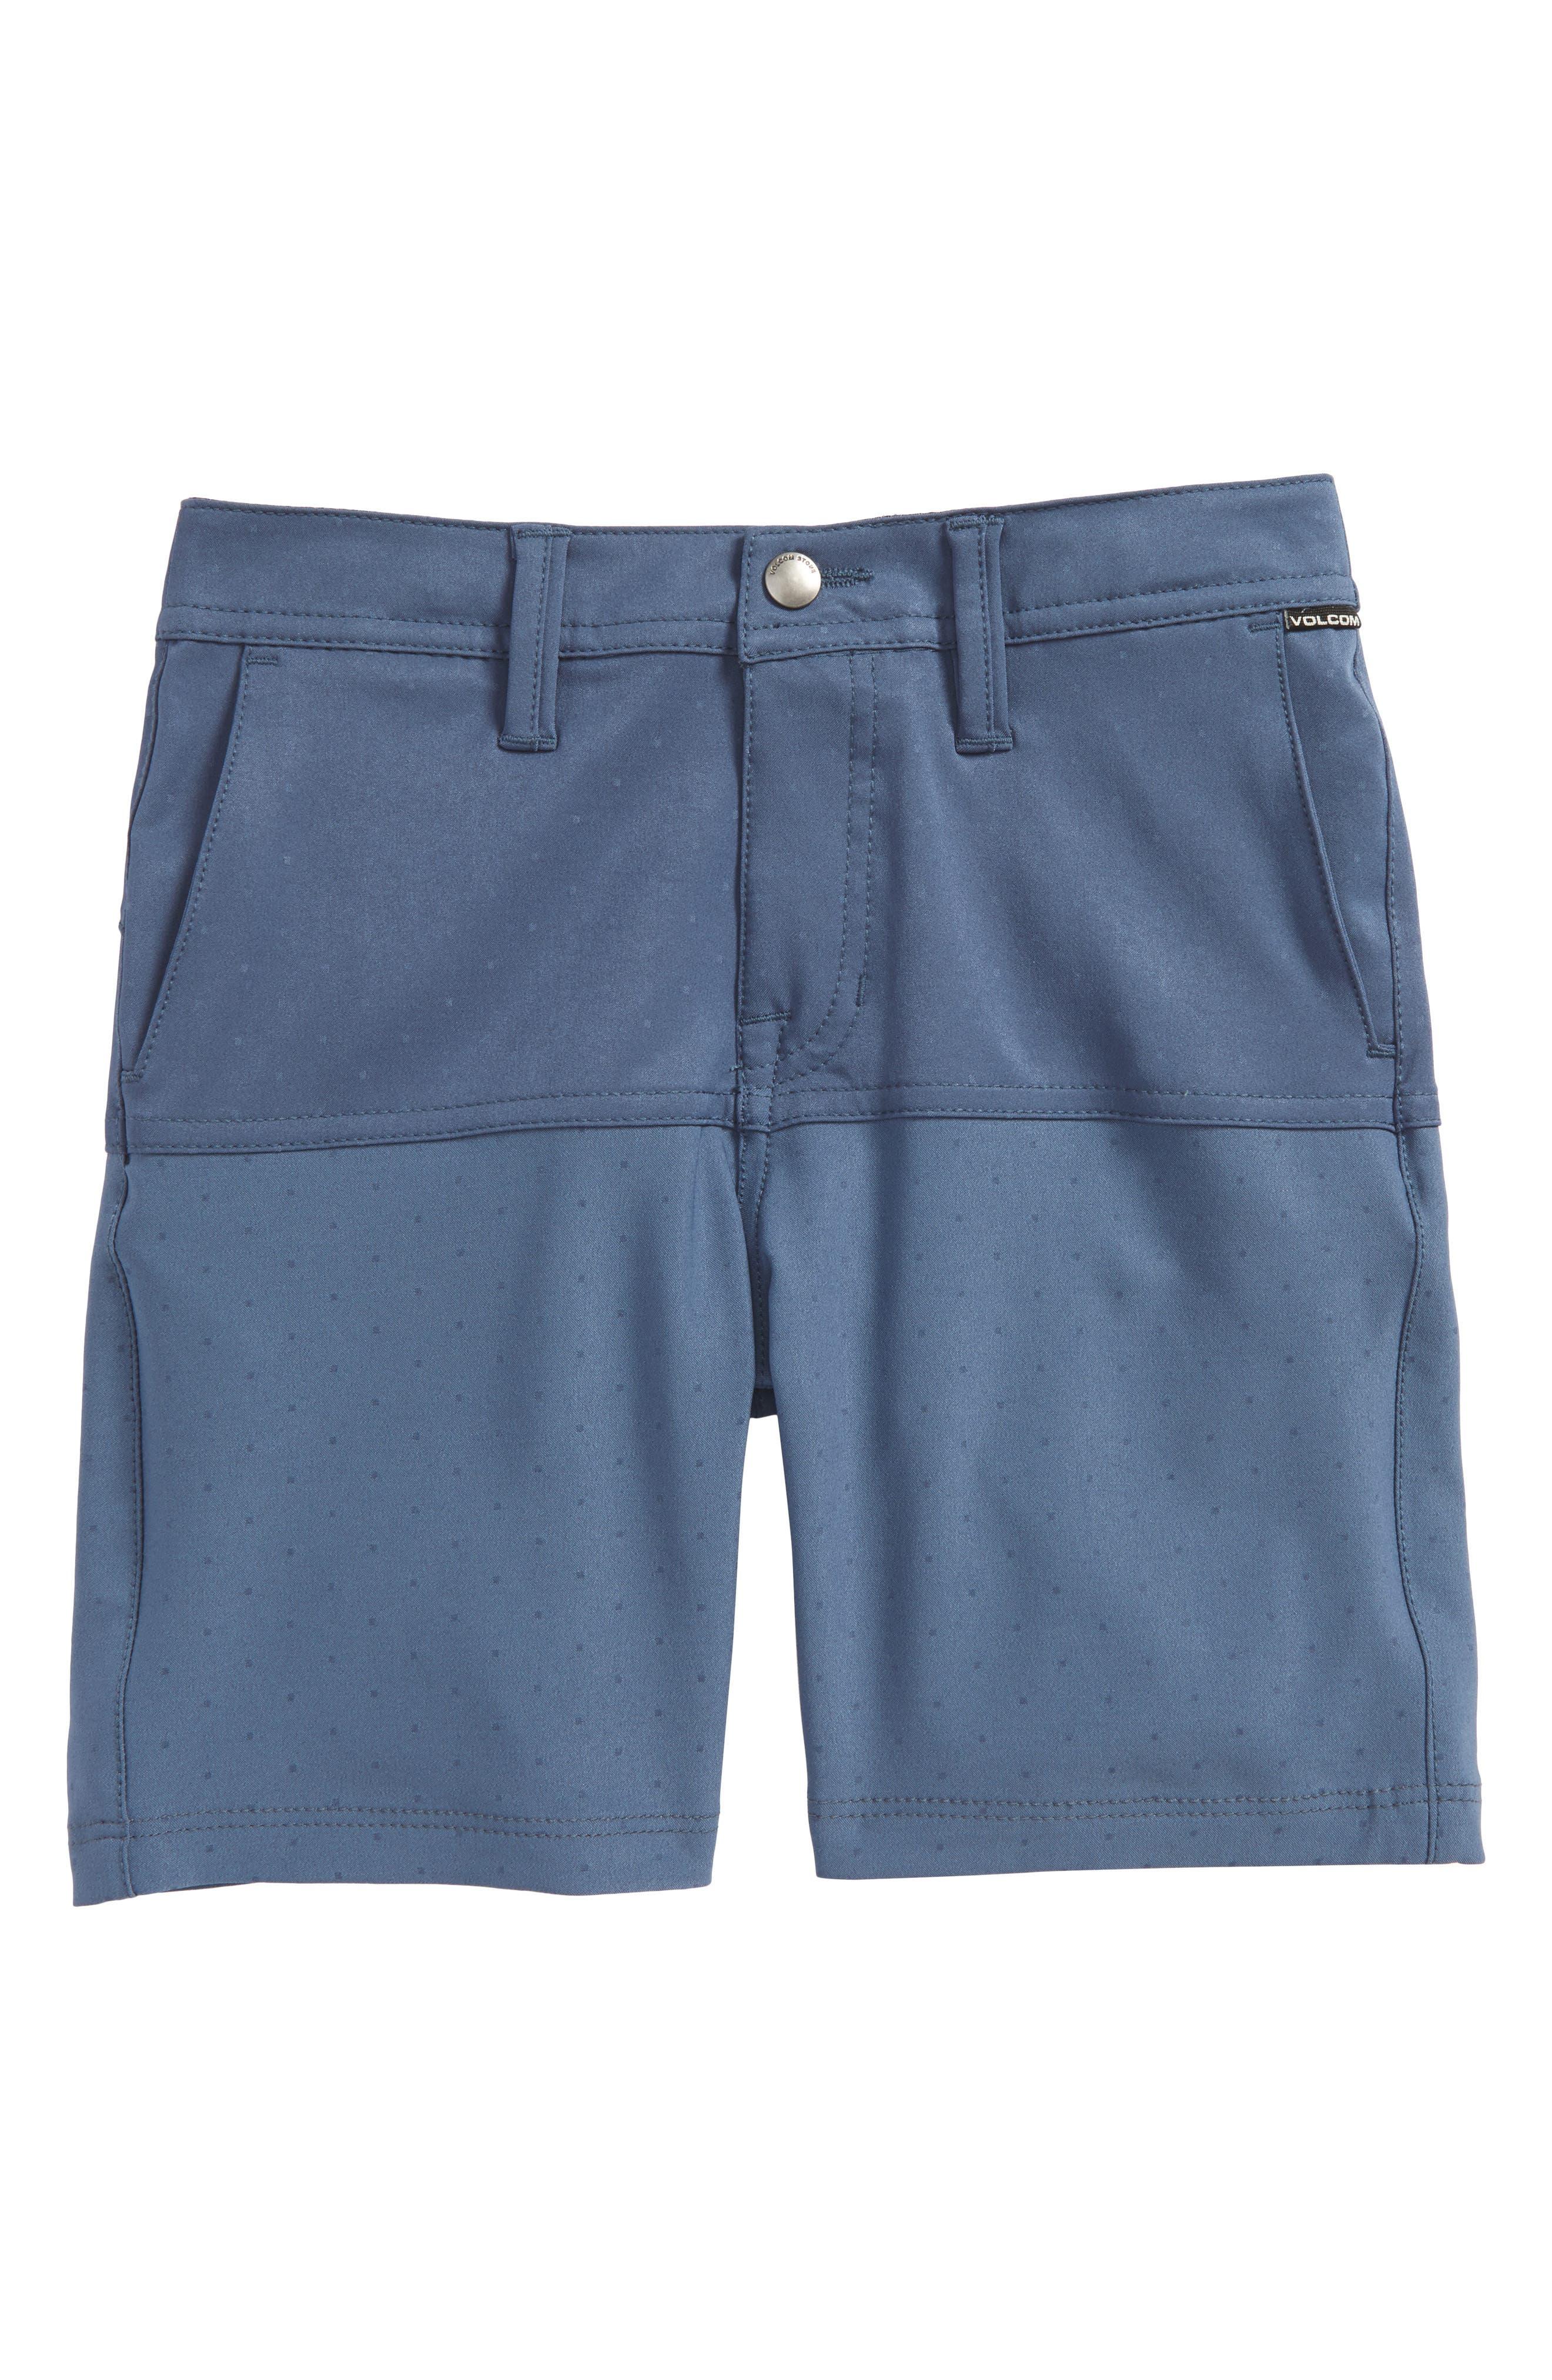 Surf N' Turf Hybrid Shorts,                             Main thumbnail 1, color,                             Deep Blue